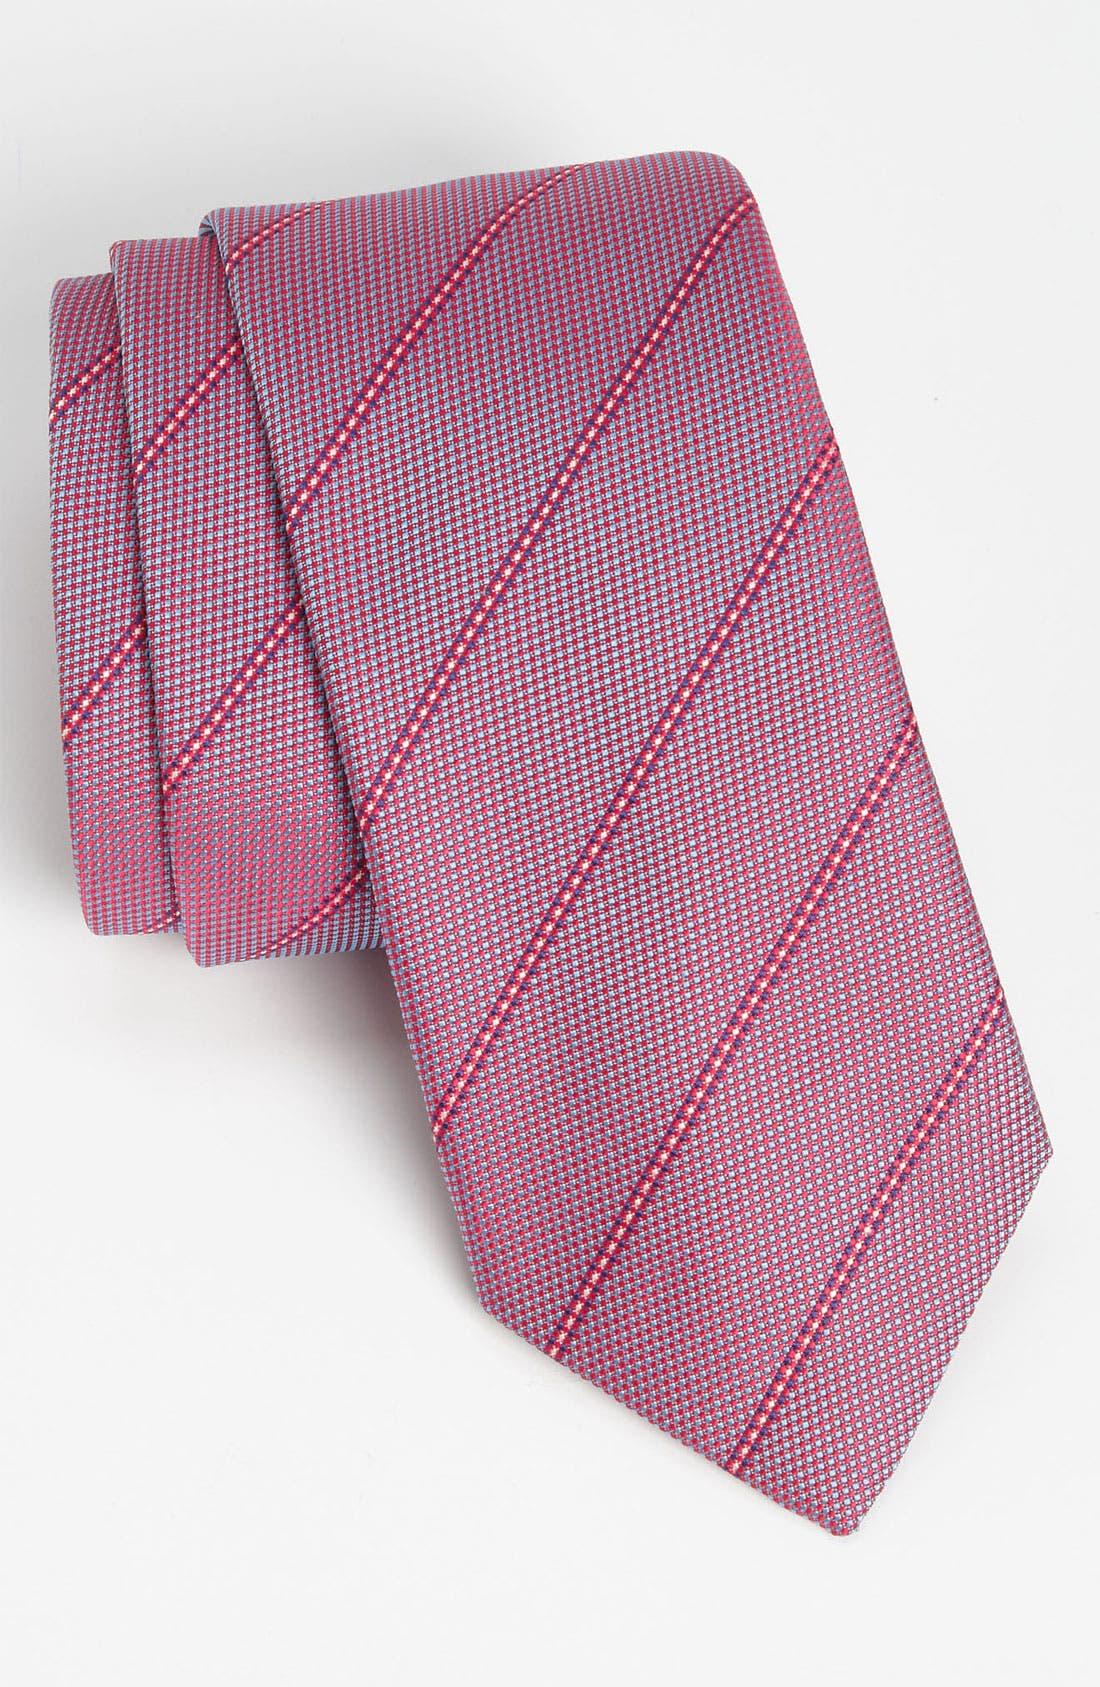 Main Image - Thomas Pink 'Turner Stripe' Woven Silk Tie